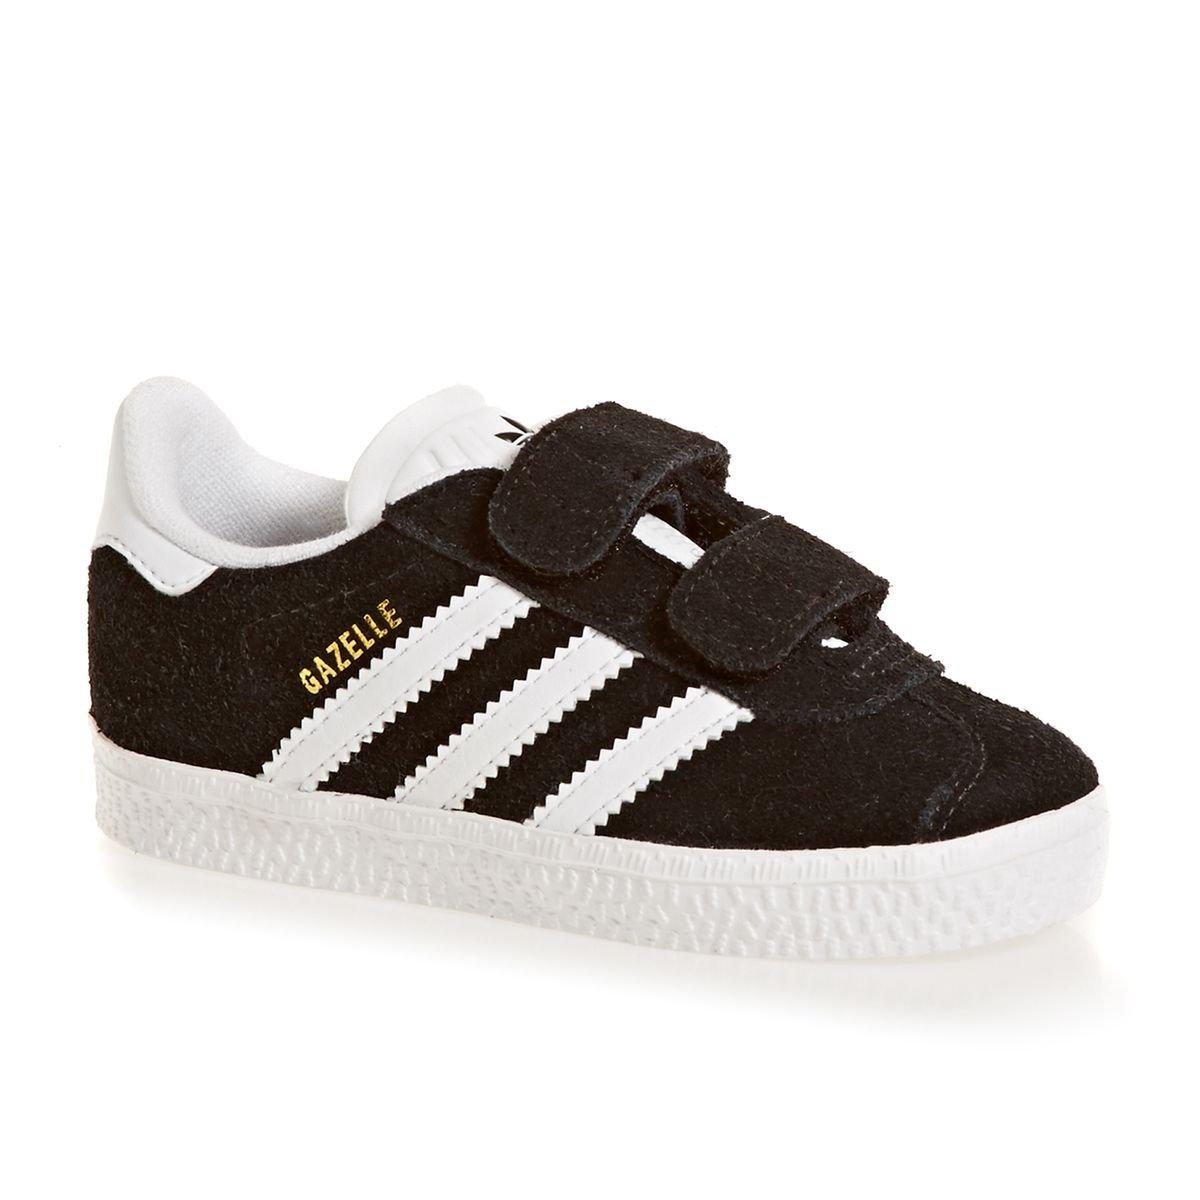 Adidas Gazelle CF I, Chaussons Mixte bébé 4013